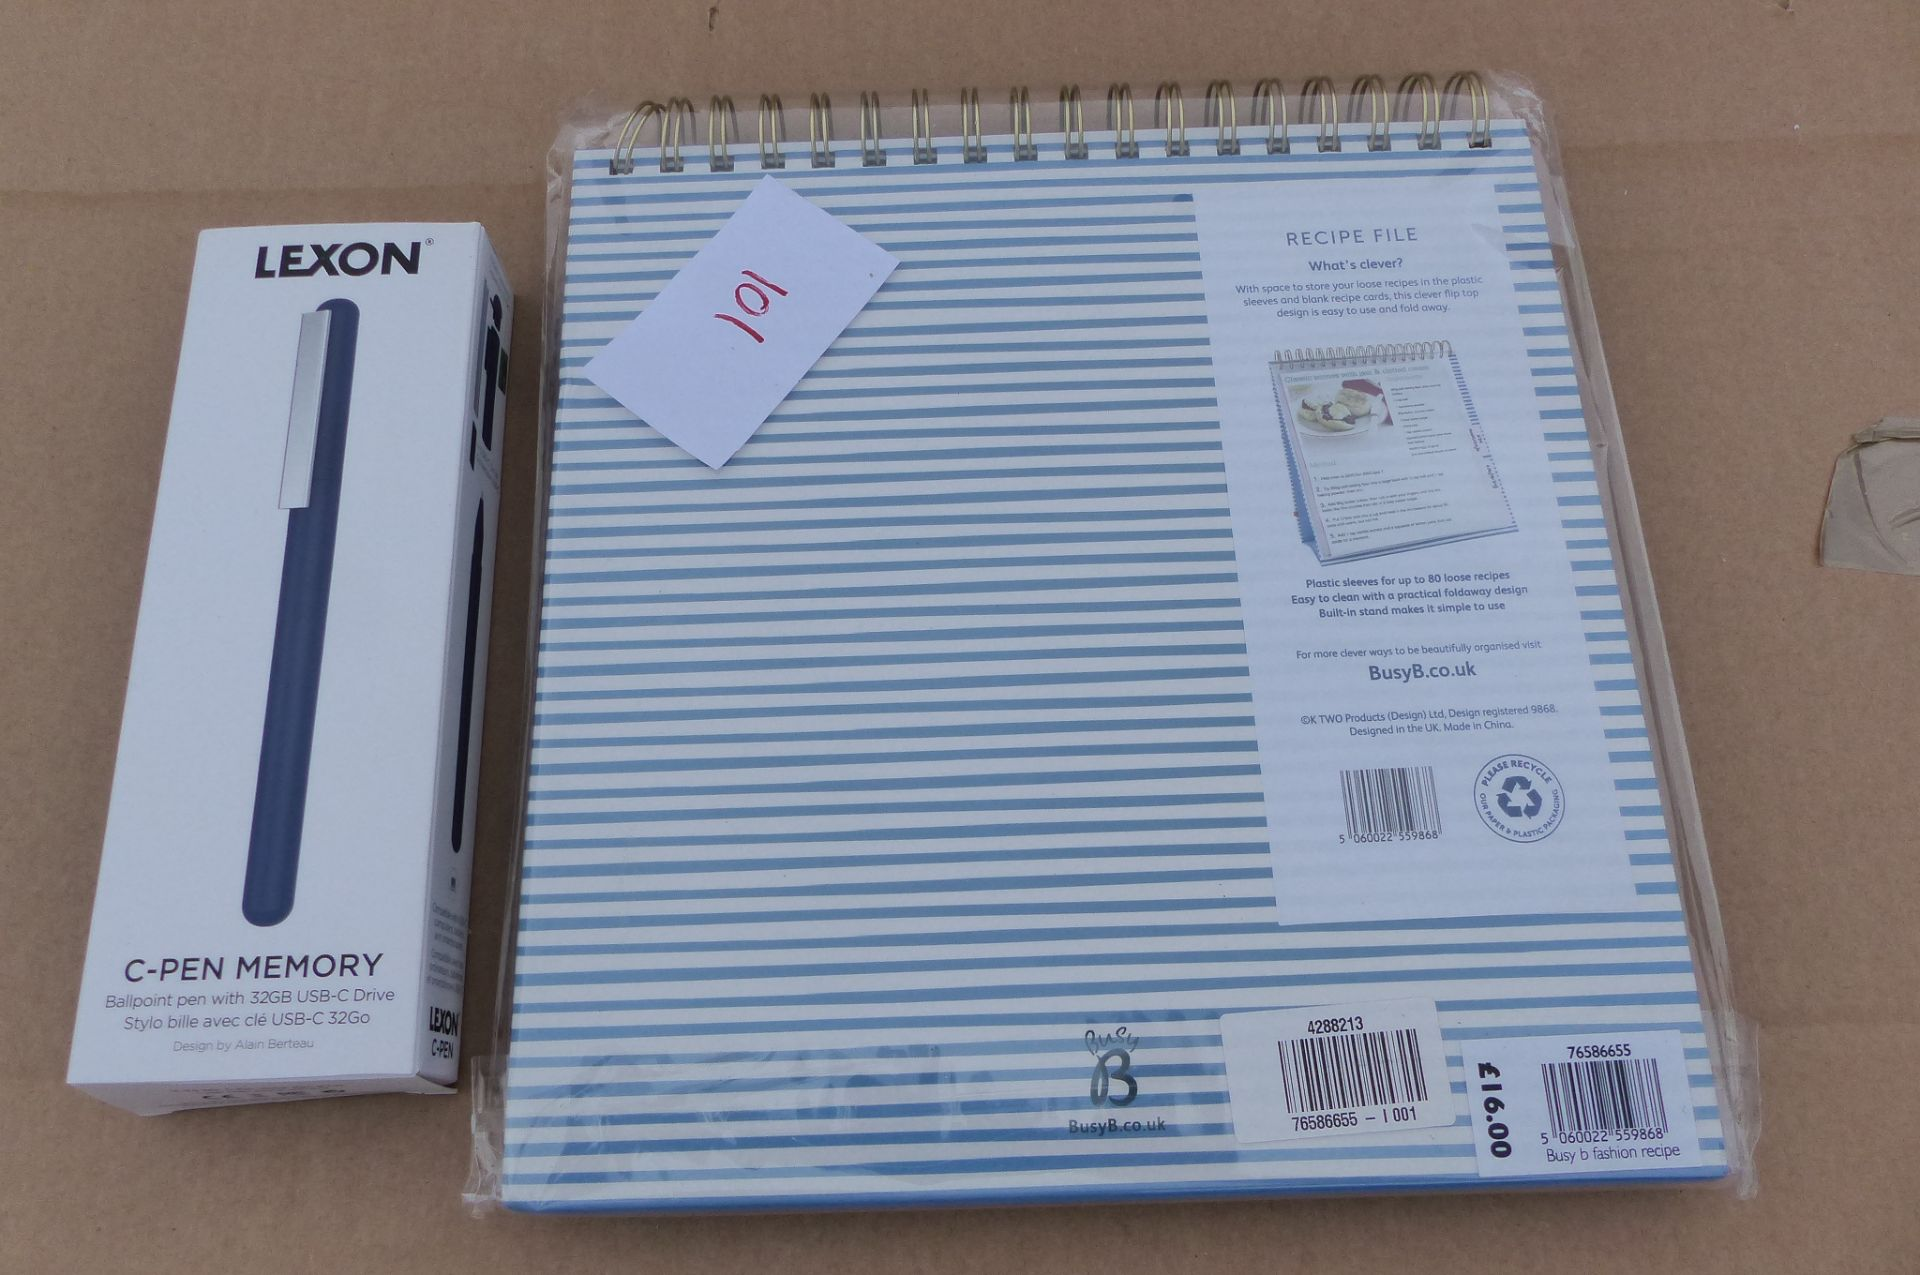 Lexon C Pen Memory and Recipe file